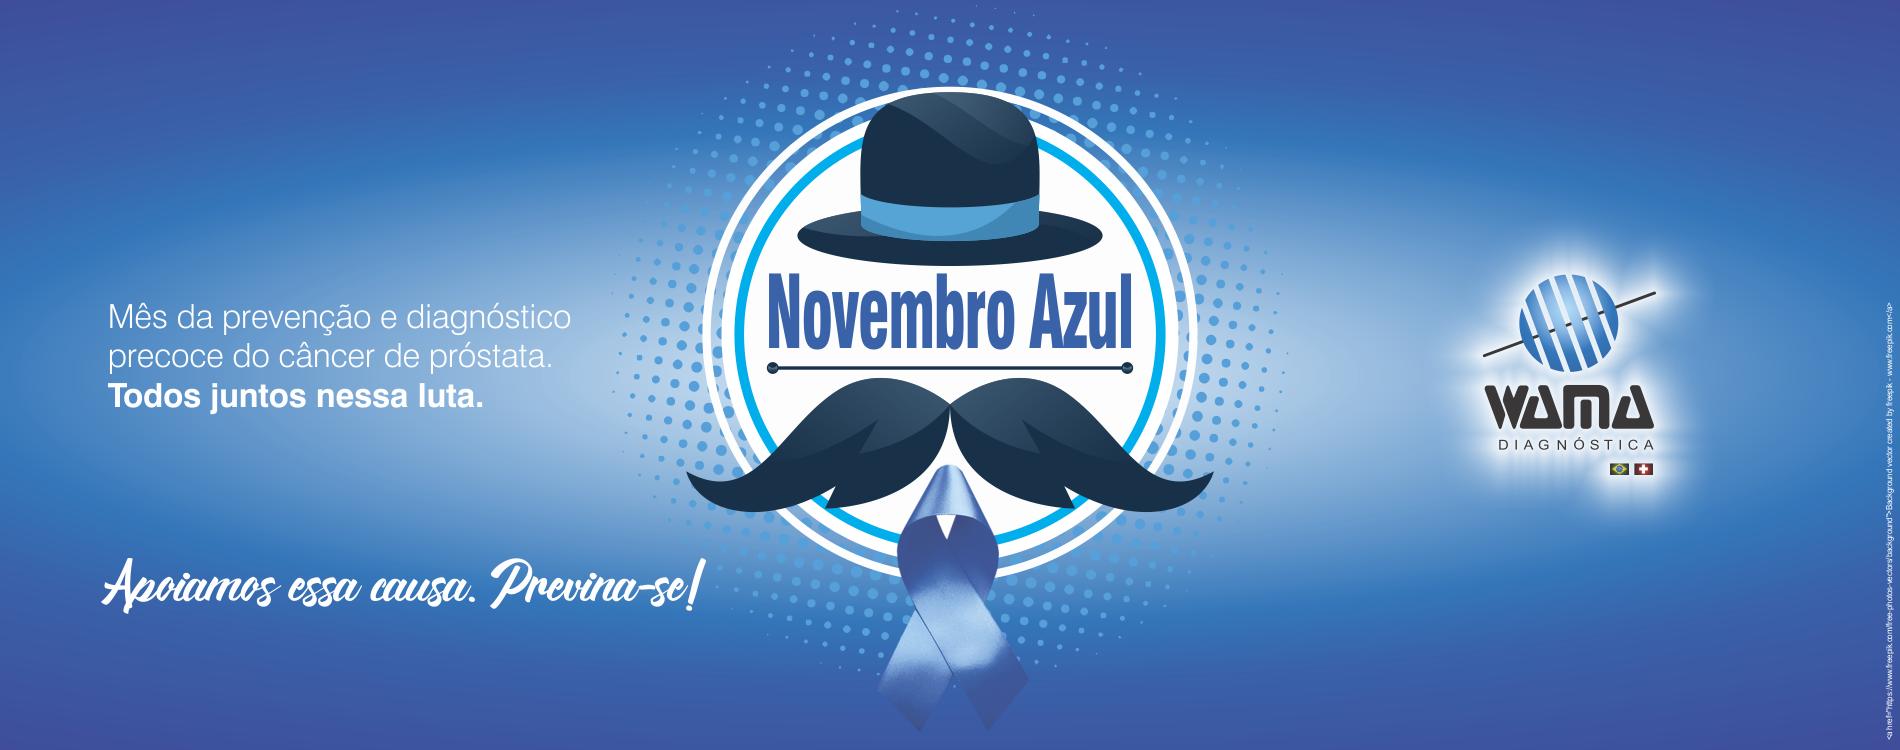 Wama Novembro Azul 2019